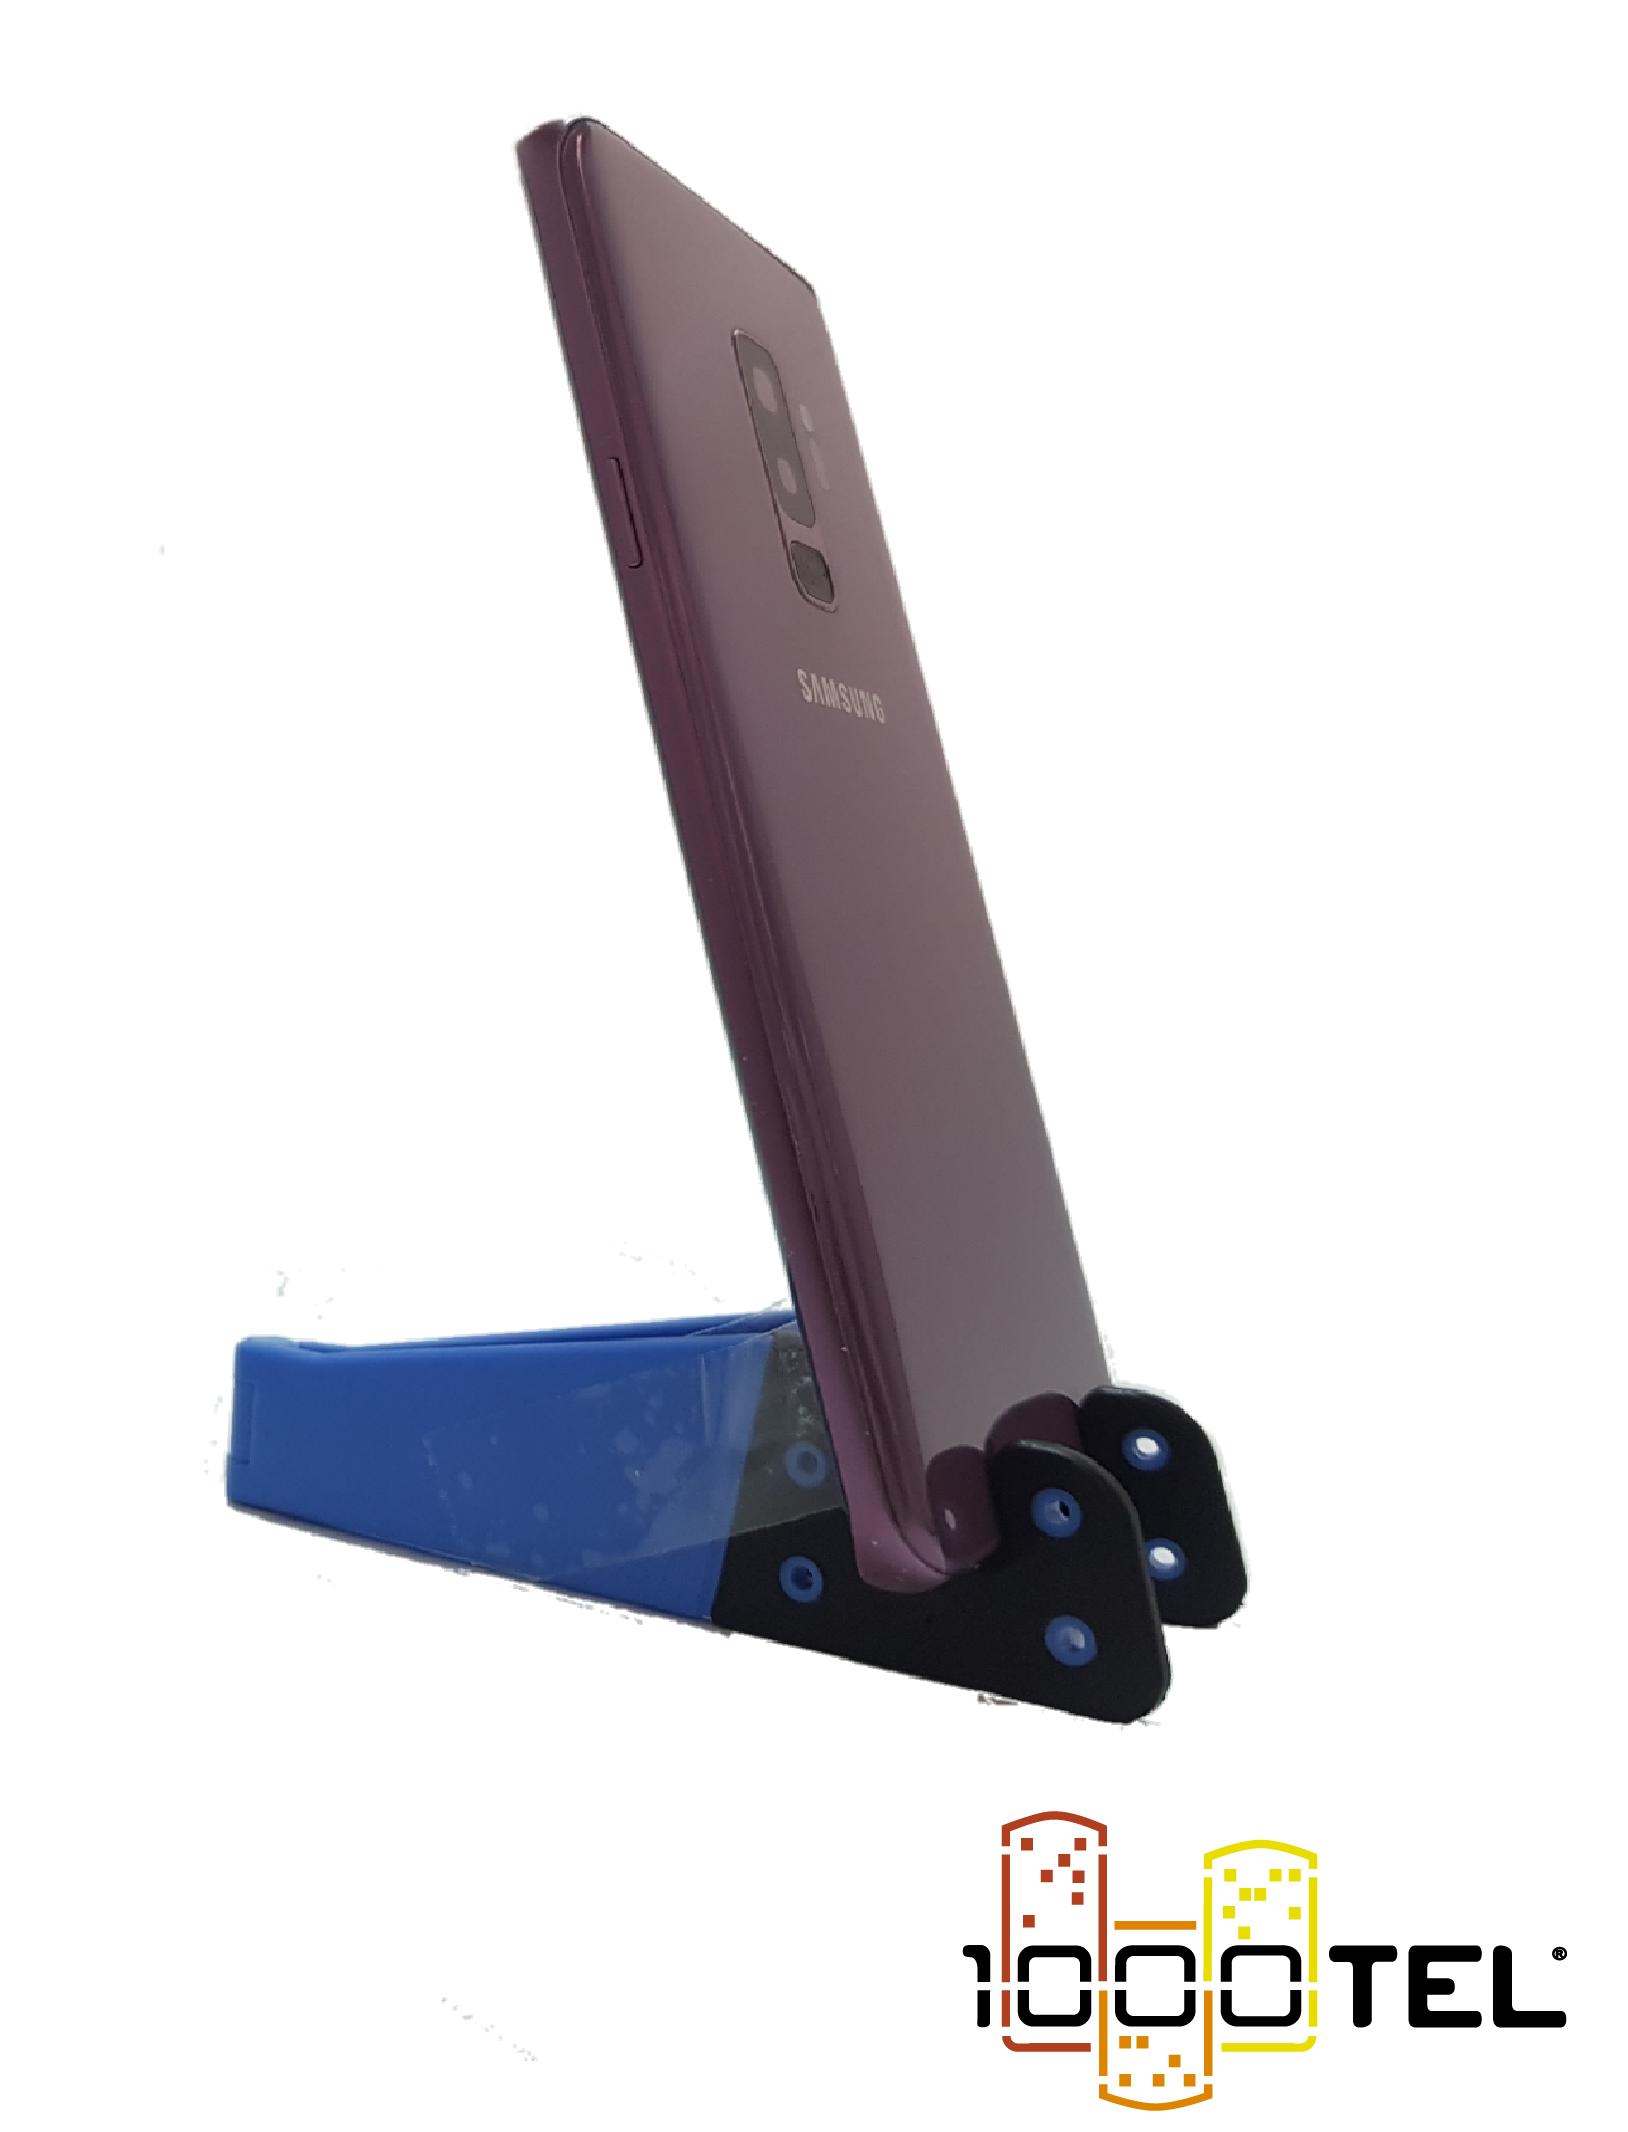 Samsung Galaxy S9 Plus 128GB #4